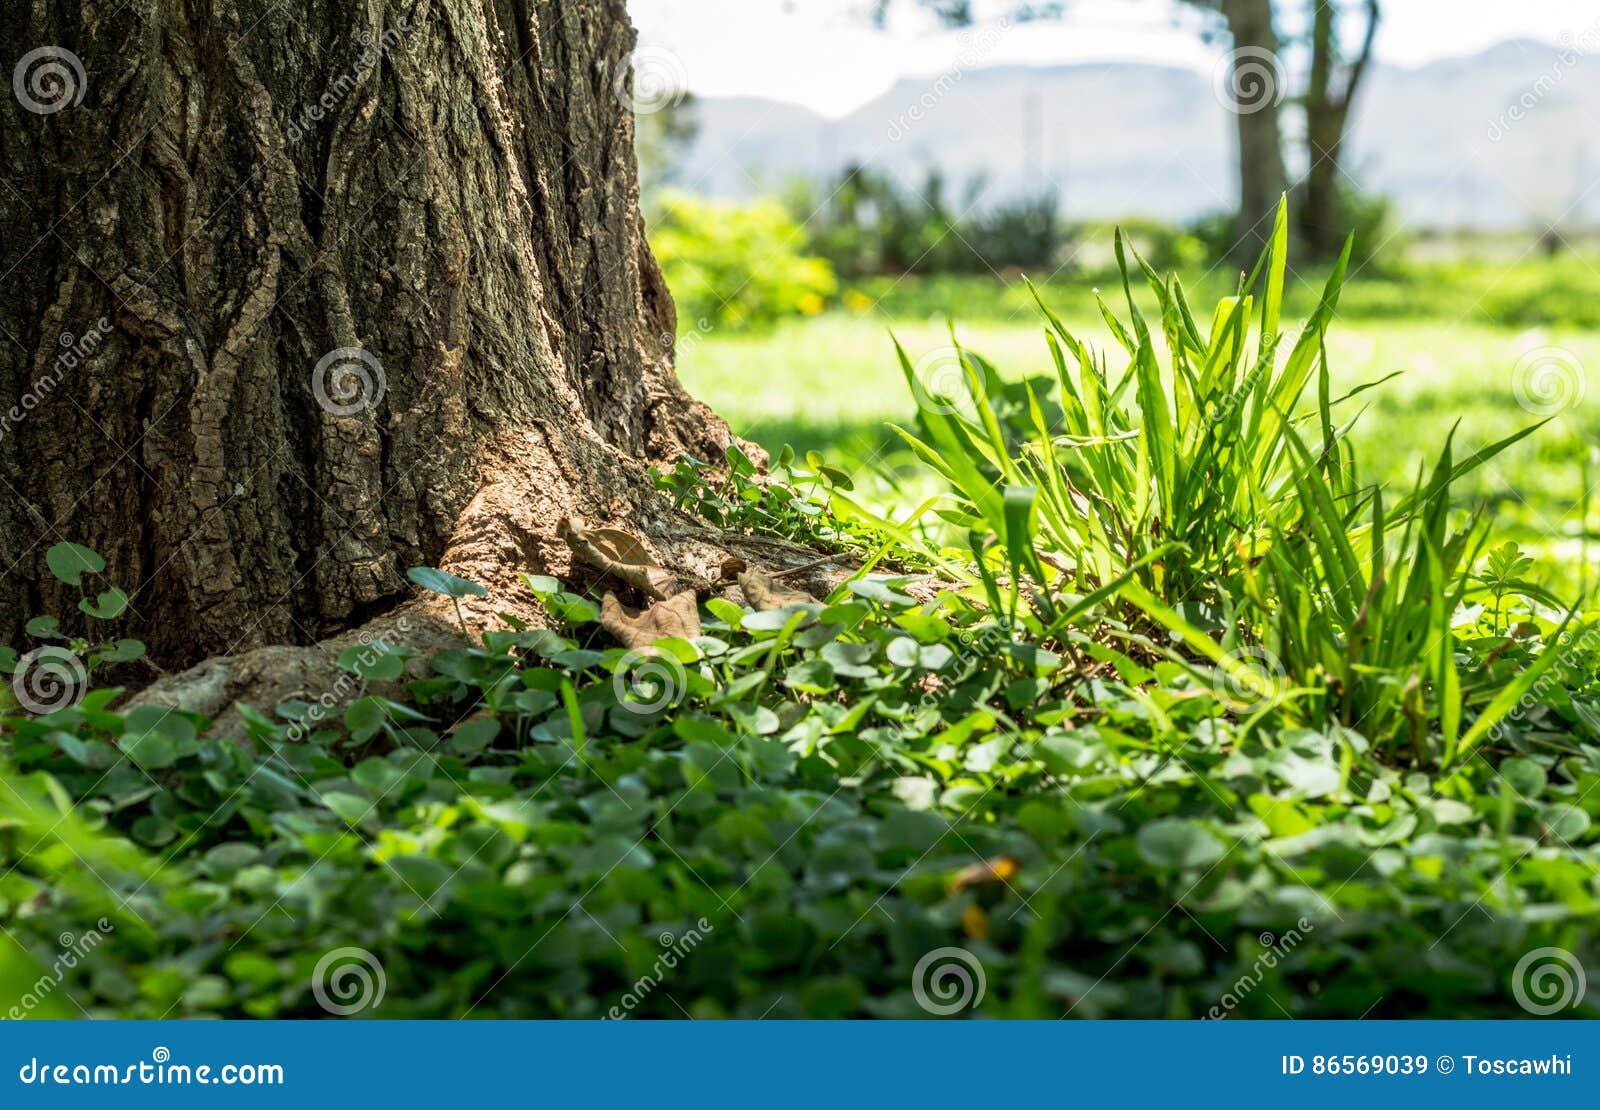 Focus on green grass clump and weeds closeup next to tree